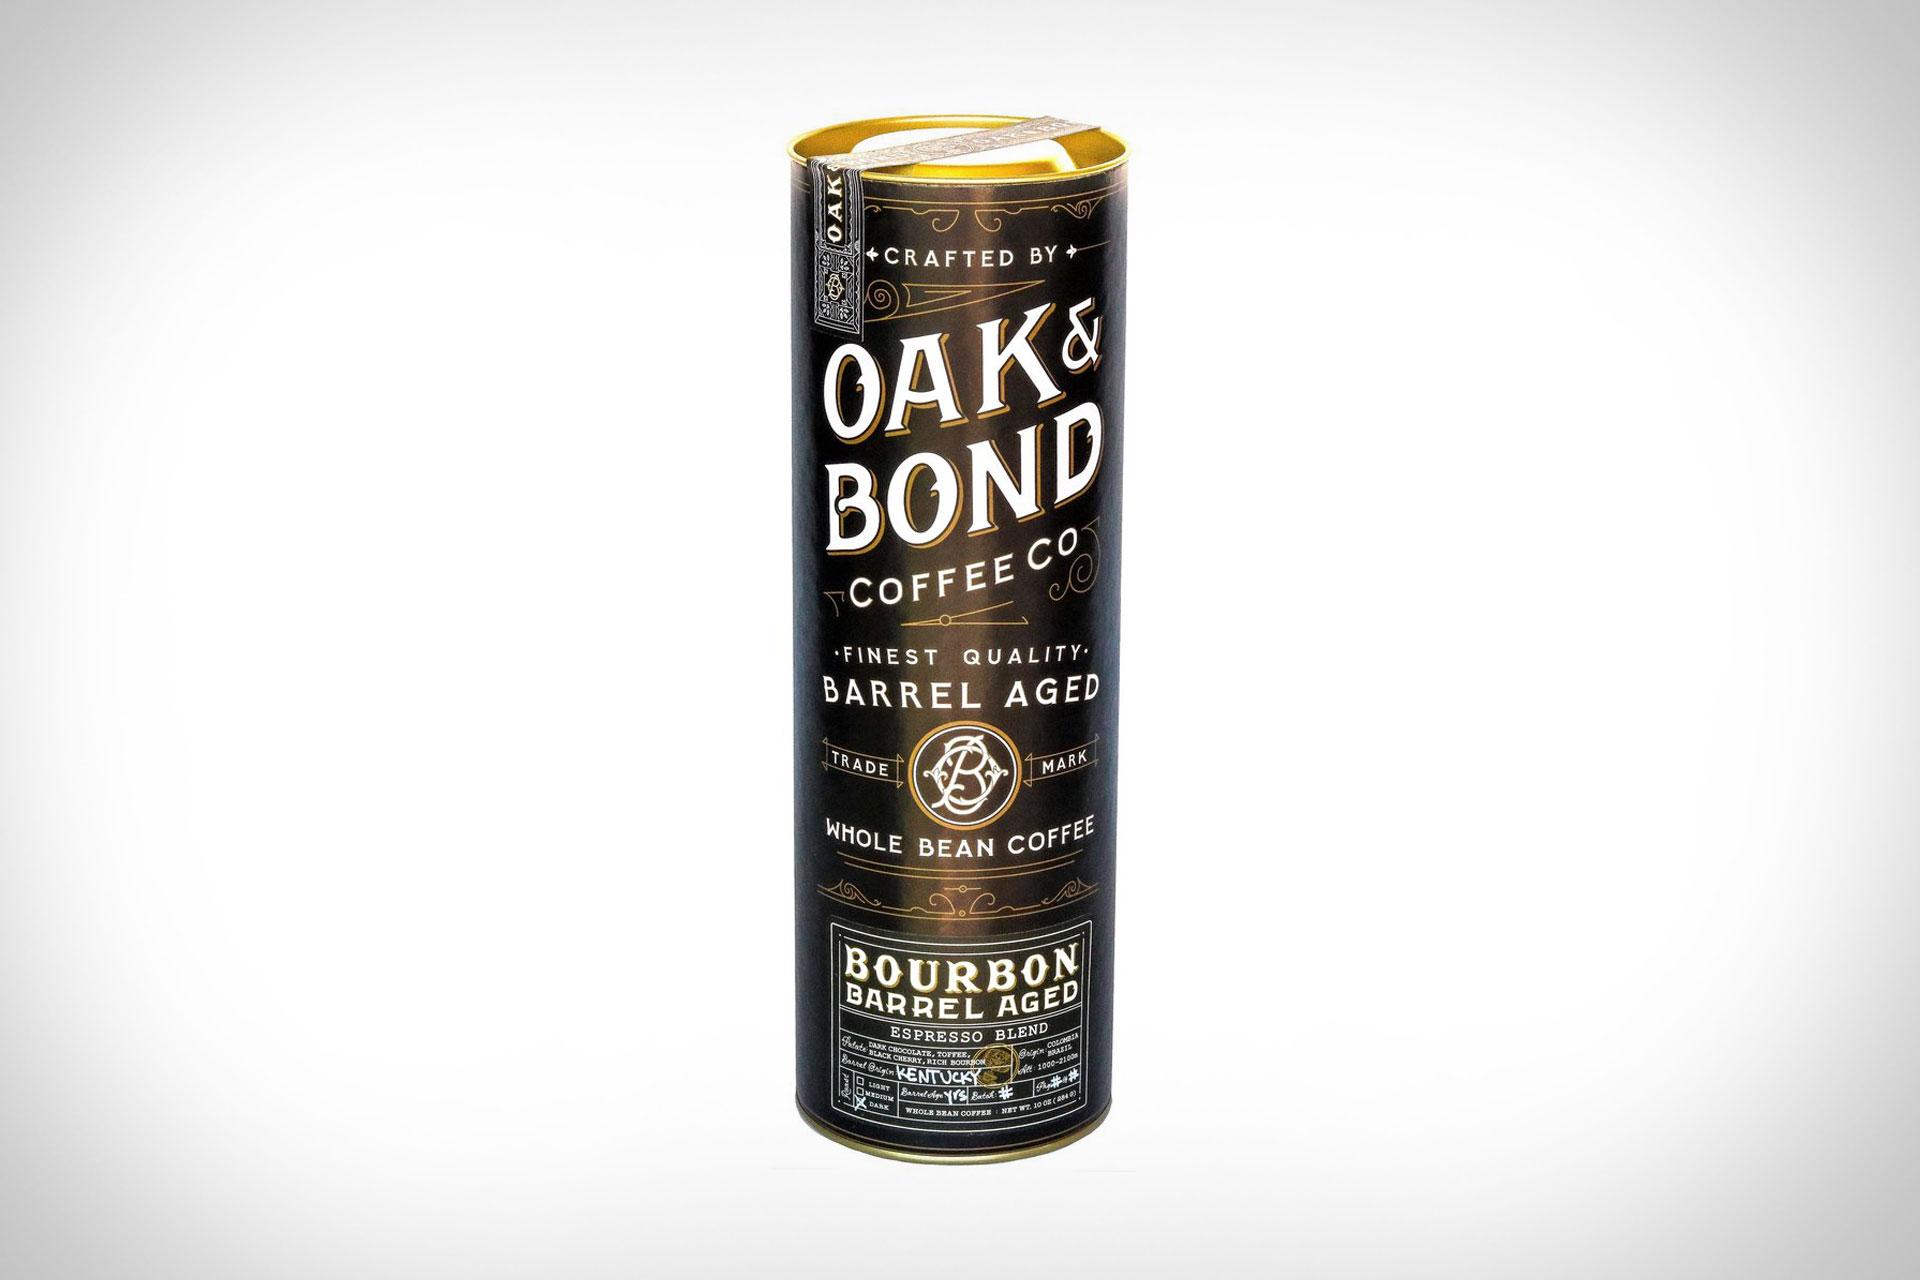 Oak & Bond Bourbon Barrel Aged Espresso Blend Coffee